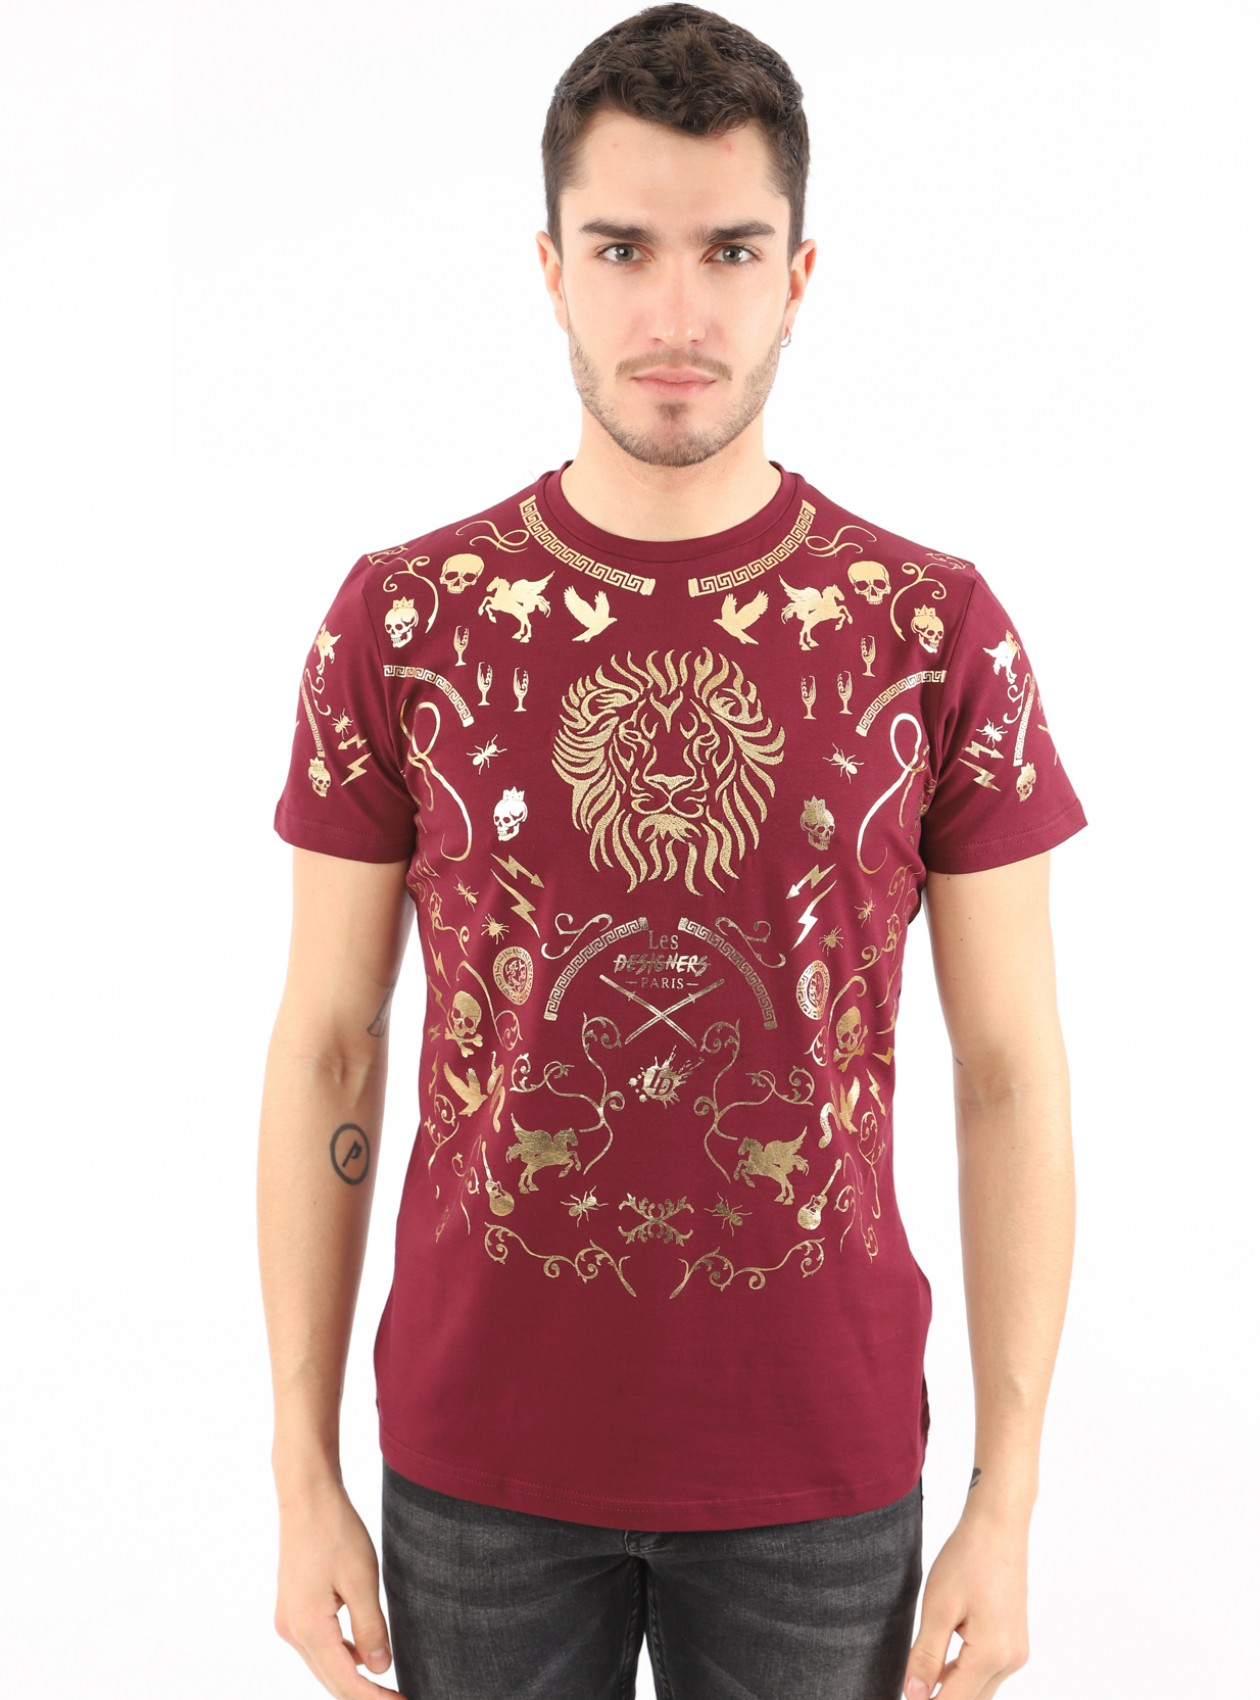 T-Shirt Homme Prune Marque